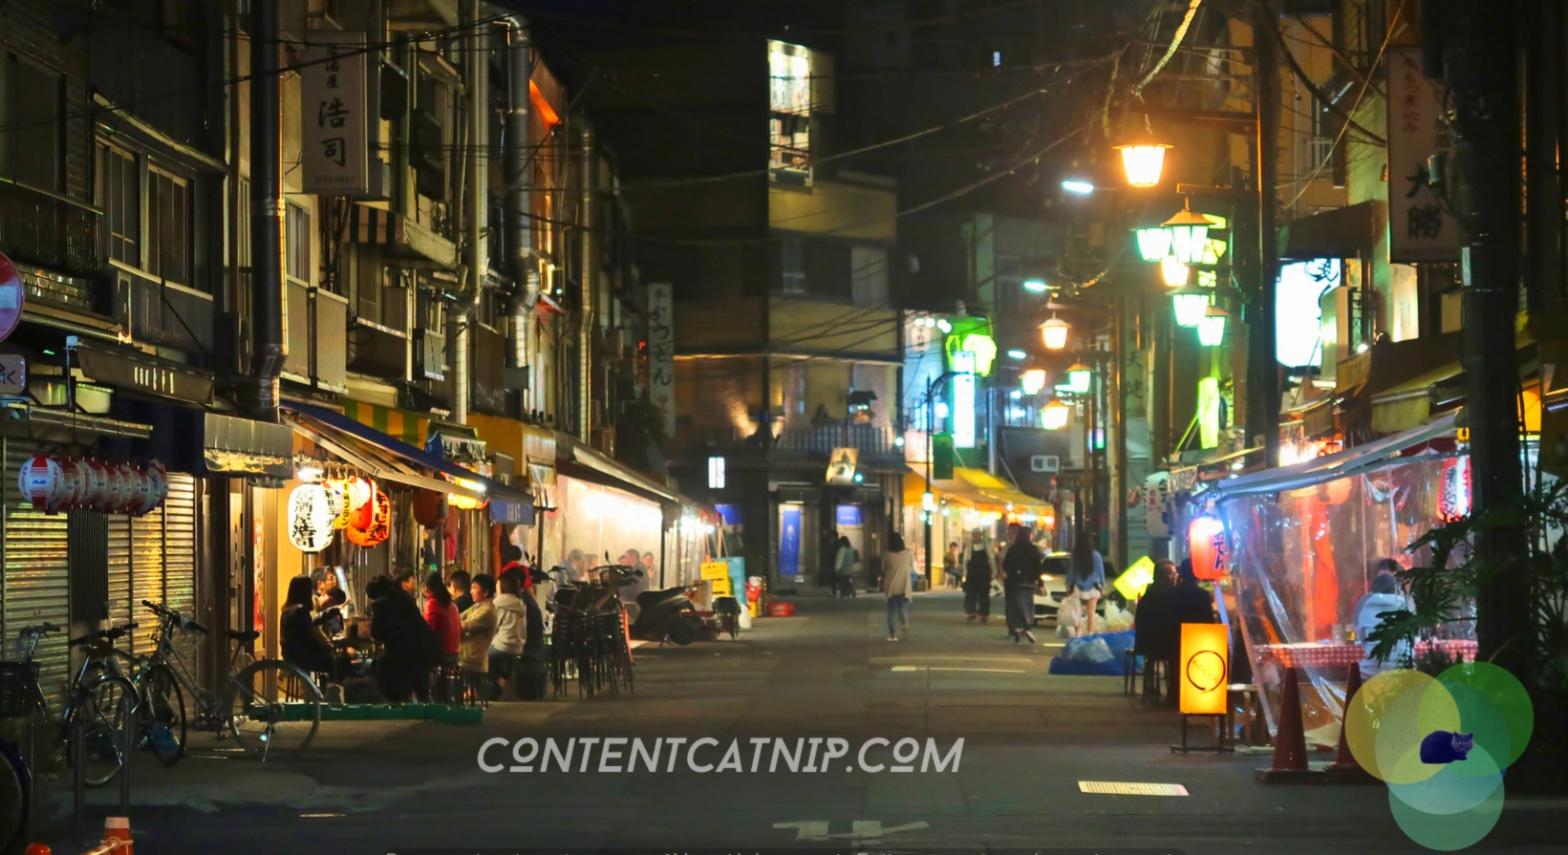 Asakusa, Tokyo by Night. Copyright © Content Catnip 2018 www.contentcatnip.com